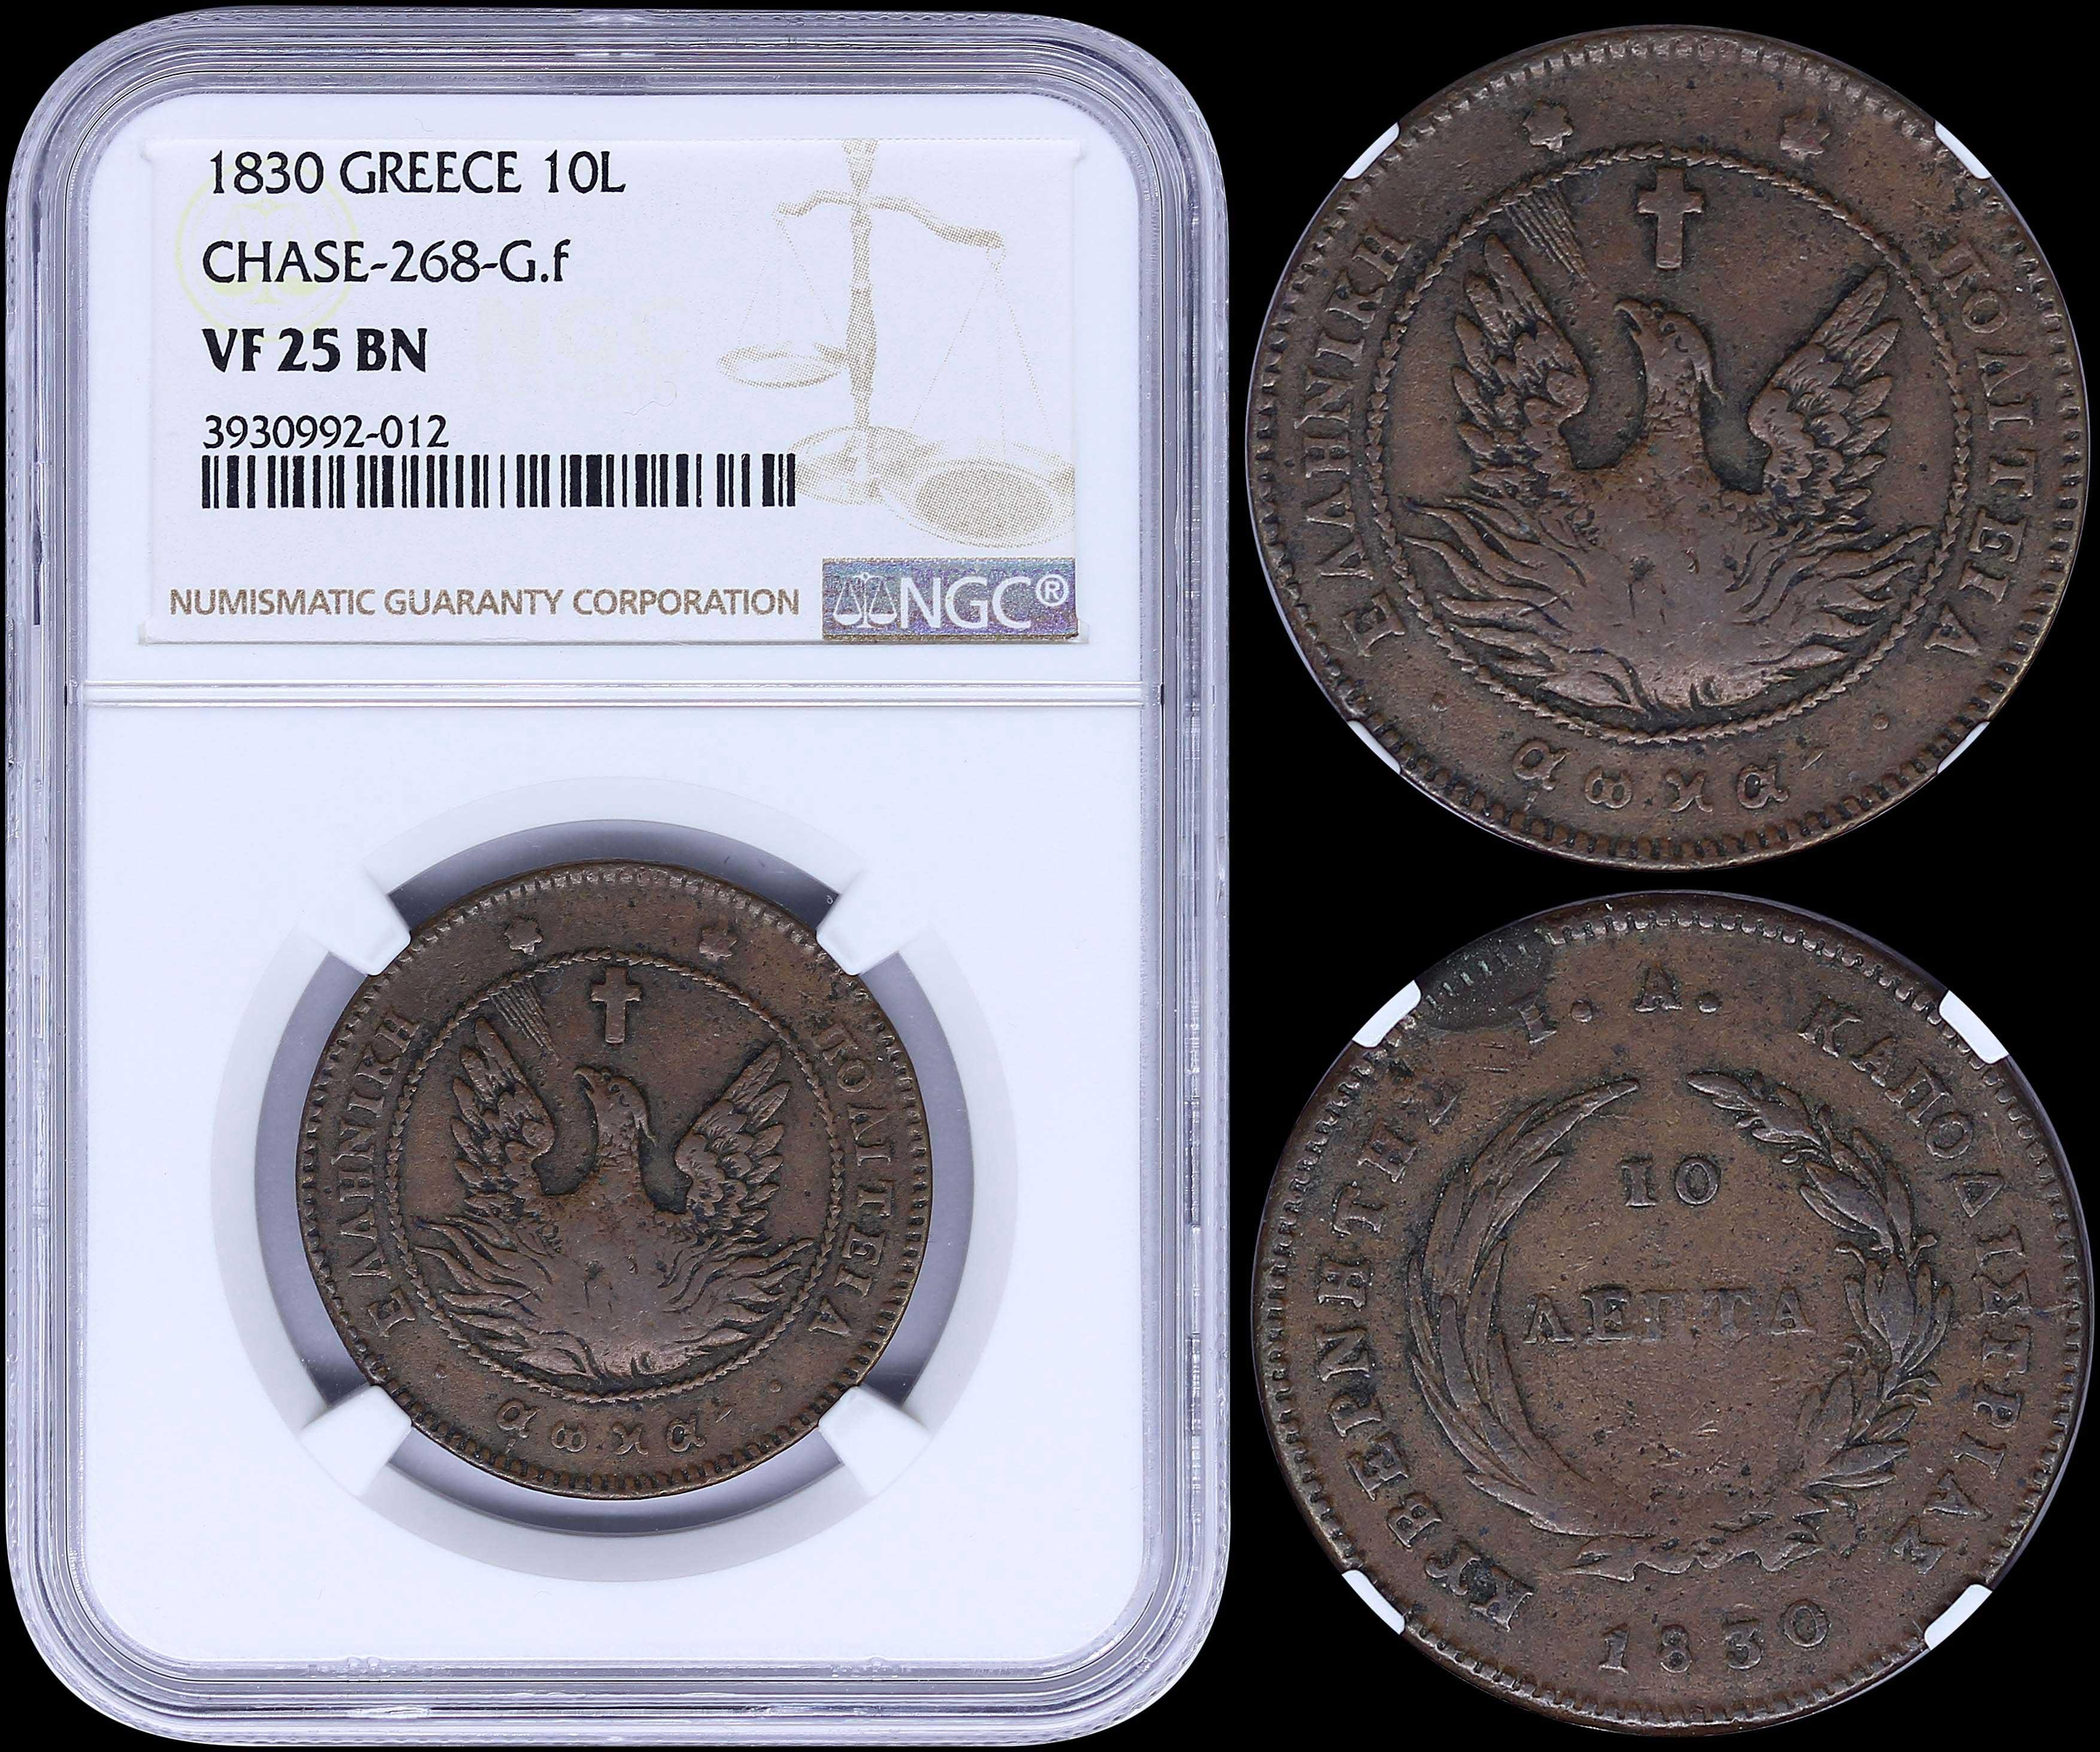 Lot 9016 - GREECE-  COINS & TOKENS governor capodistrias -  A. Karamitsos Public & LIVE Bid Auction 610 Coins, Medals & Banknotes